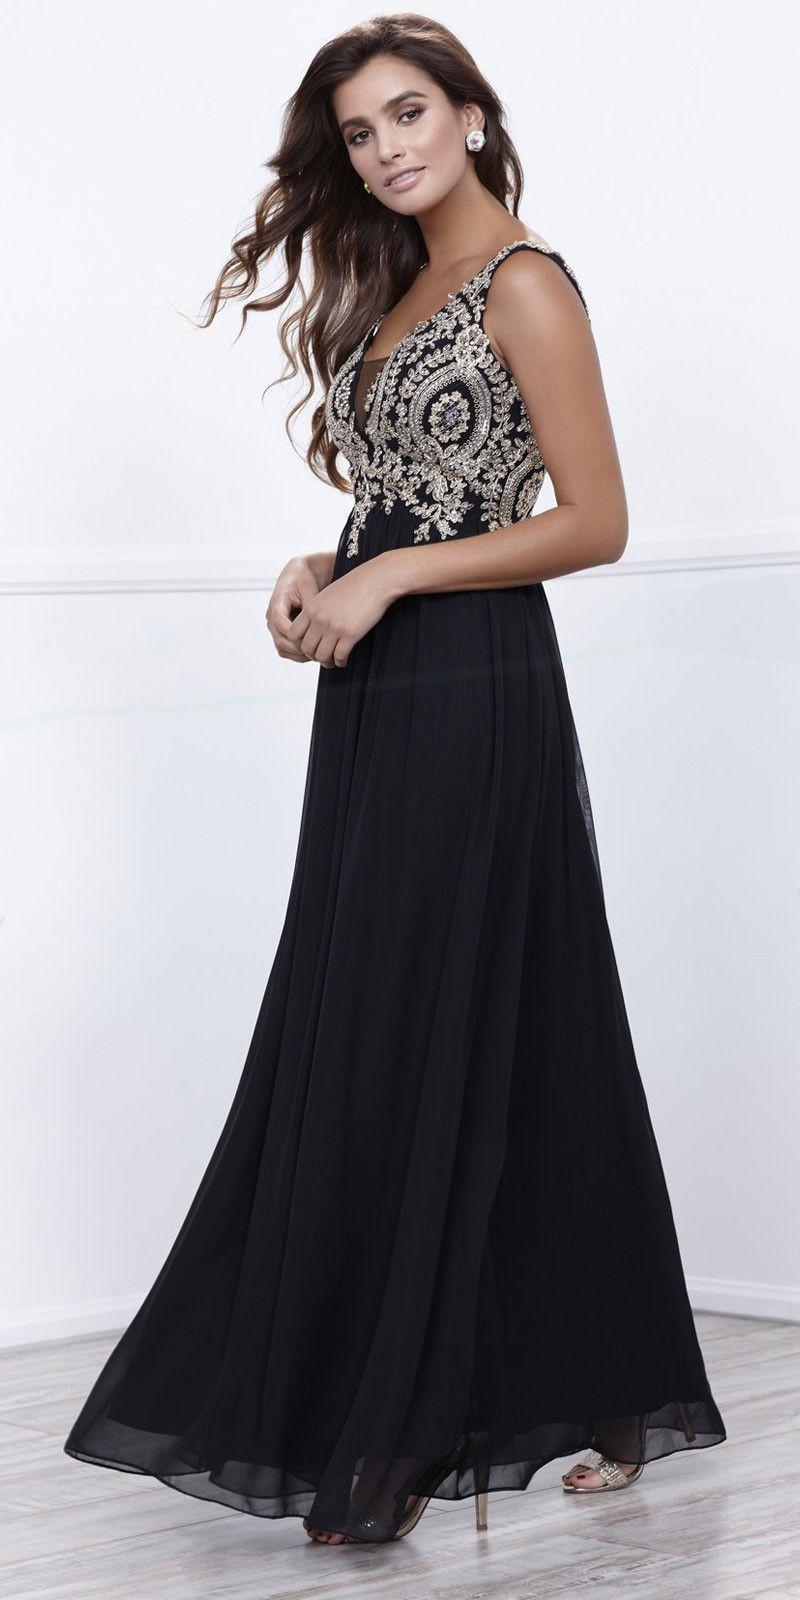 Bashful vneck sheer inset appliqued long formal dress sleeveless